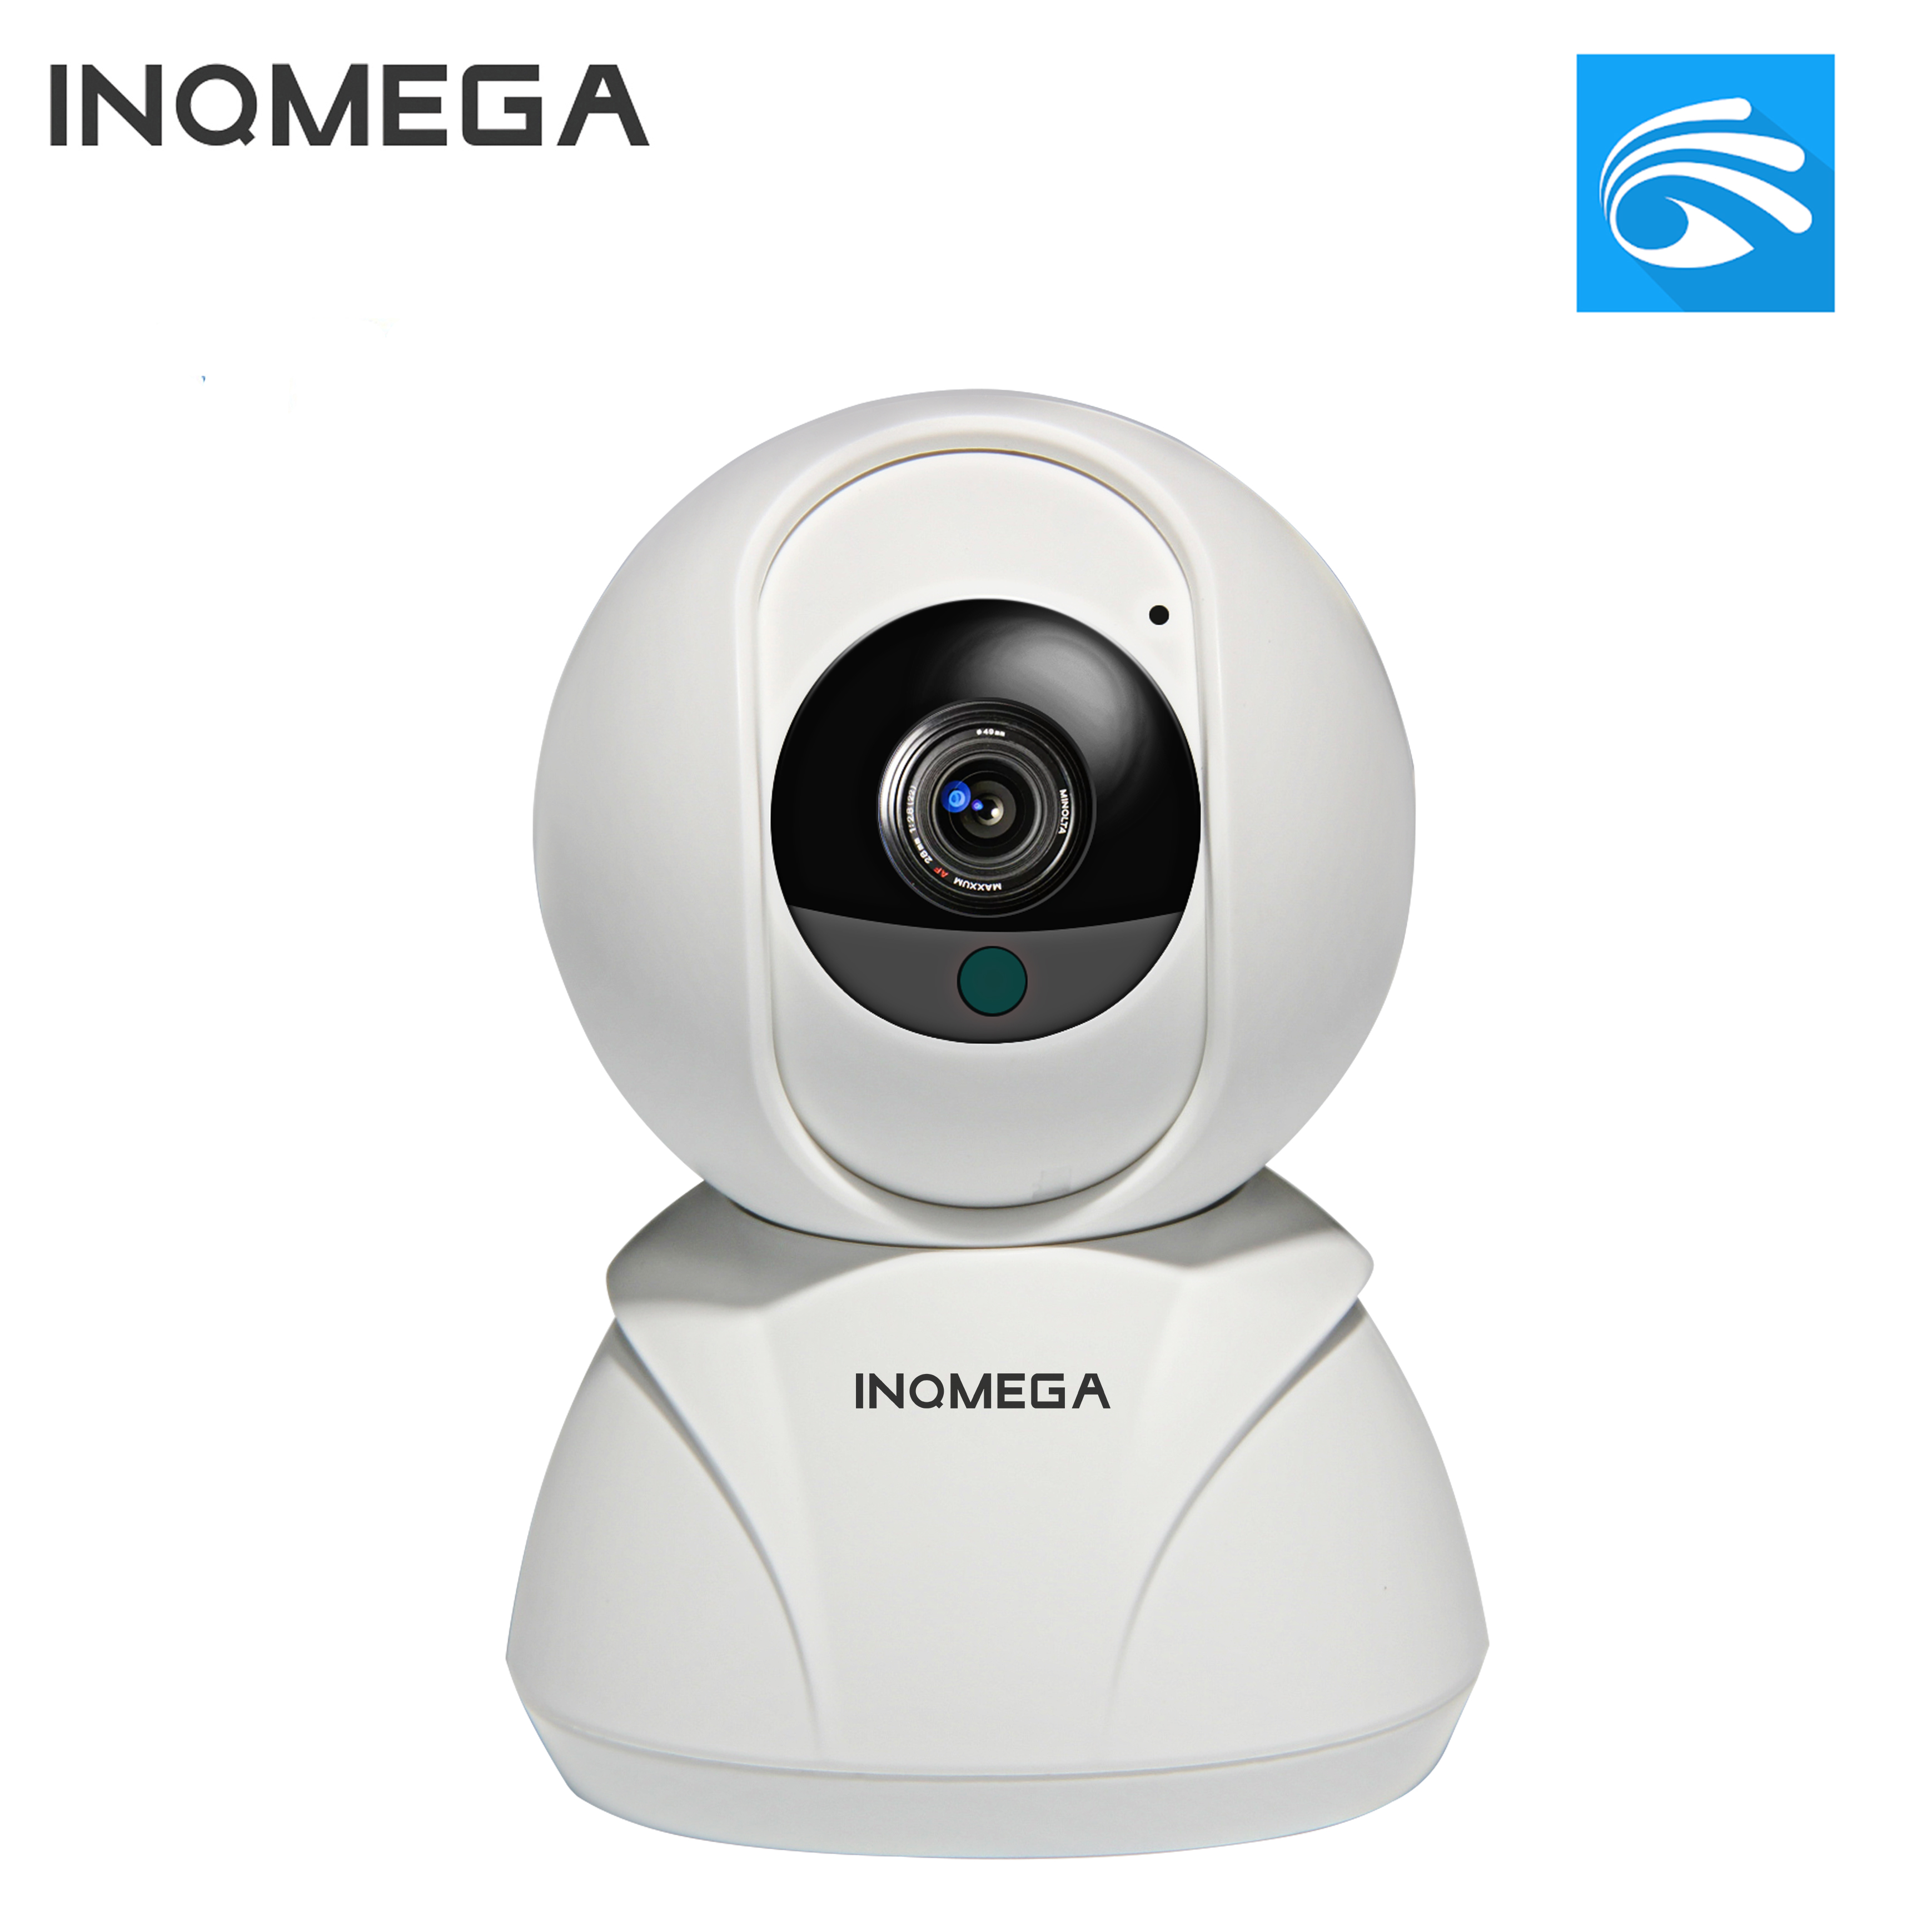 INQMEGA 1080P IP Camera Wireless Home Security Camera Surveillance Camera Wifi 2MP Night Vision CCTV Camera Baby Monitor YOOSEE|Surveillance Cameras| |  - title=